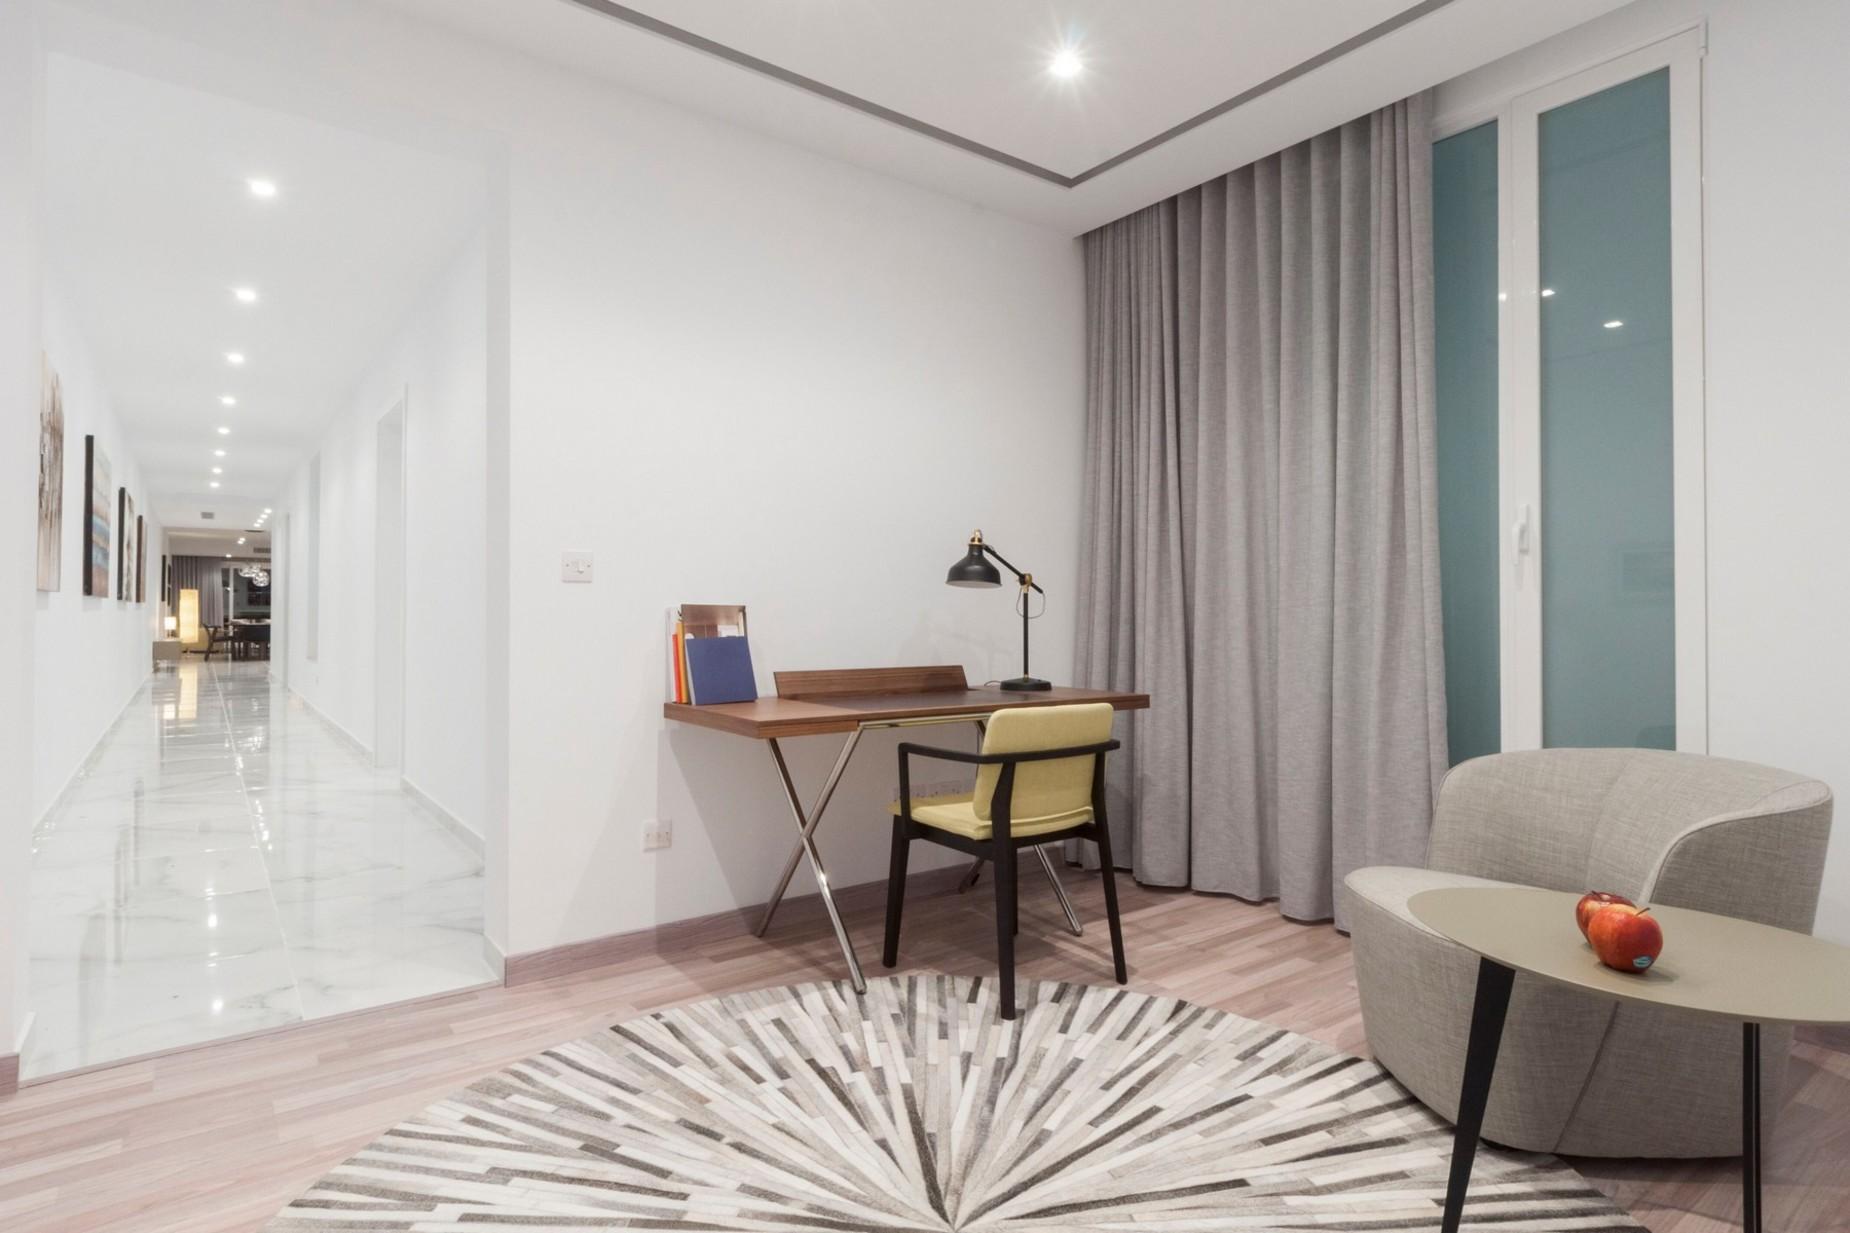 0 bed Apartment For Rent in Sliema, Sliema - thumb 7